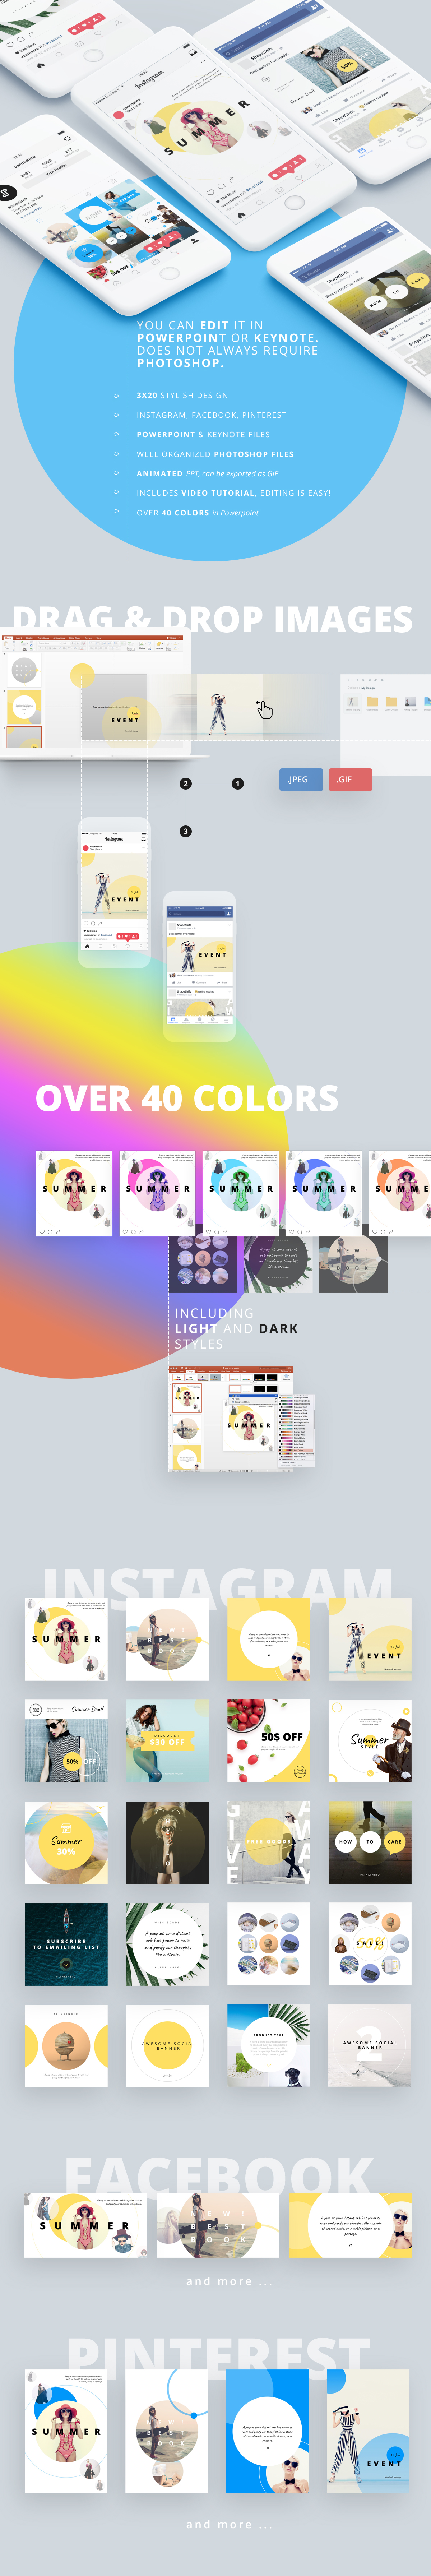 ravi animated social media pack by shapeslide graphicriver